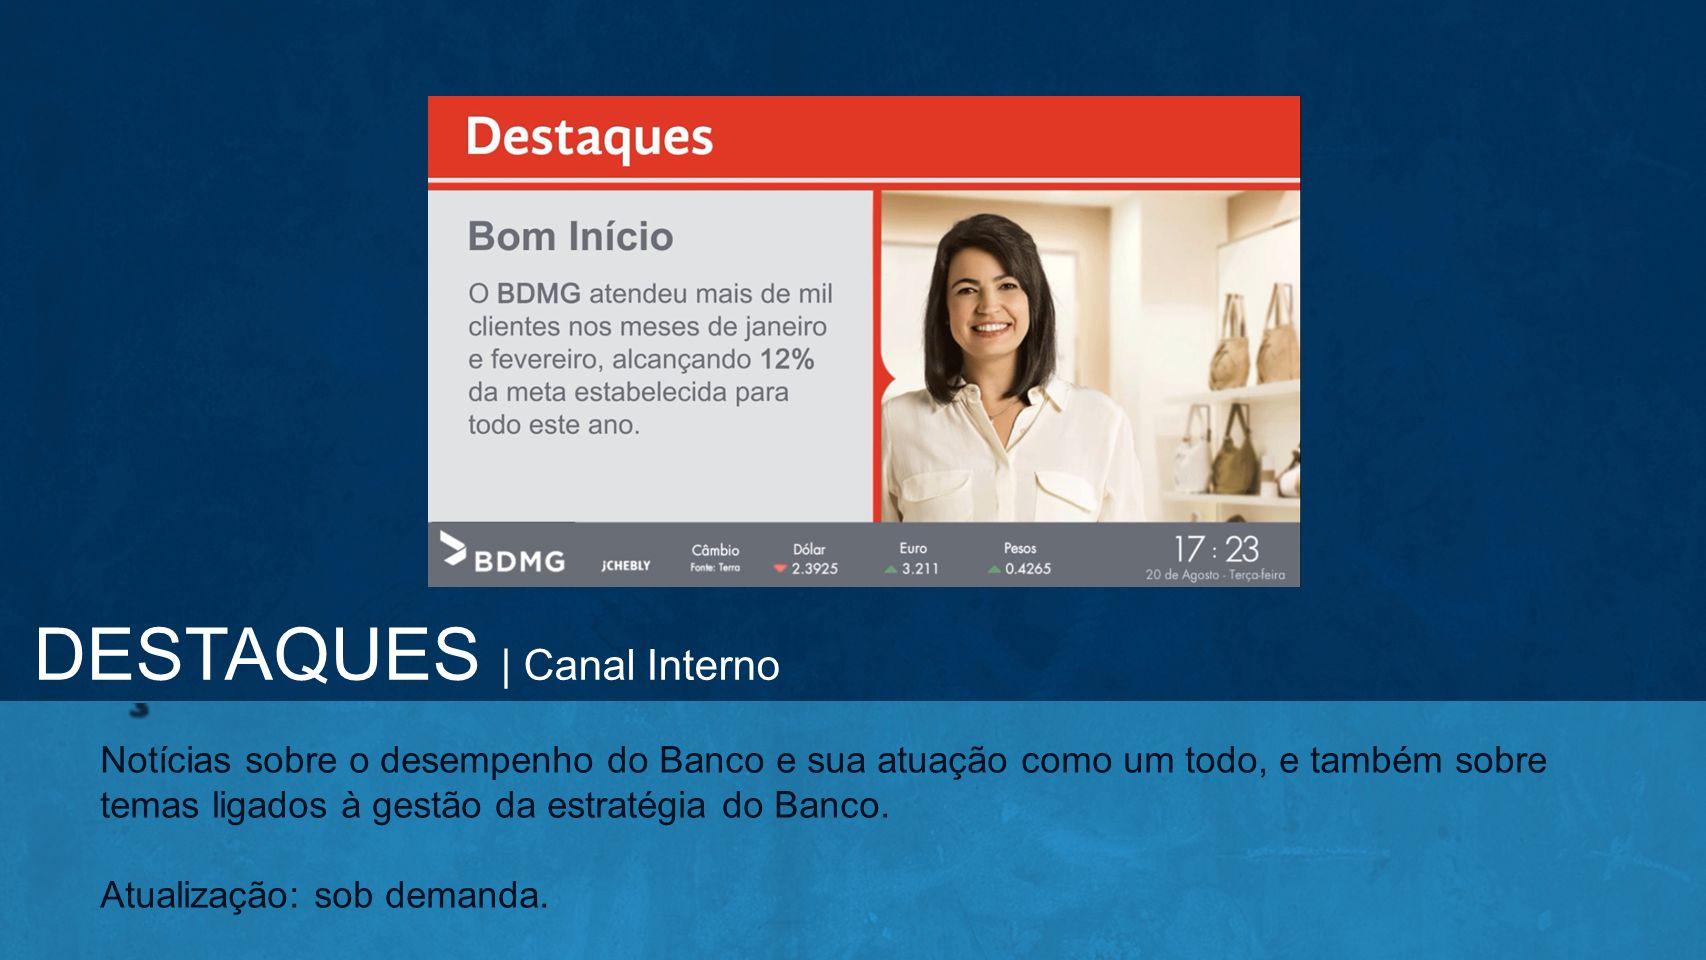 DESTAQUES | Canal Interno